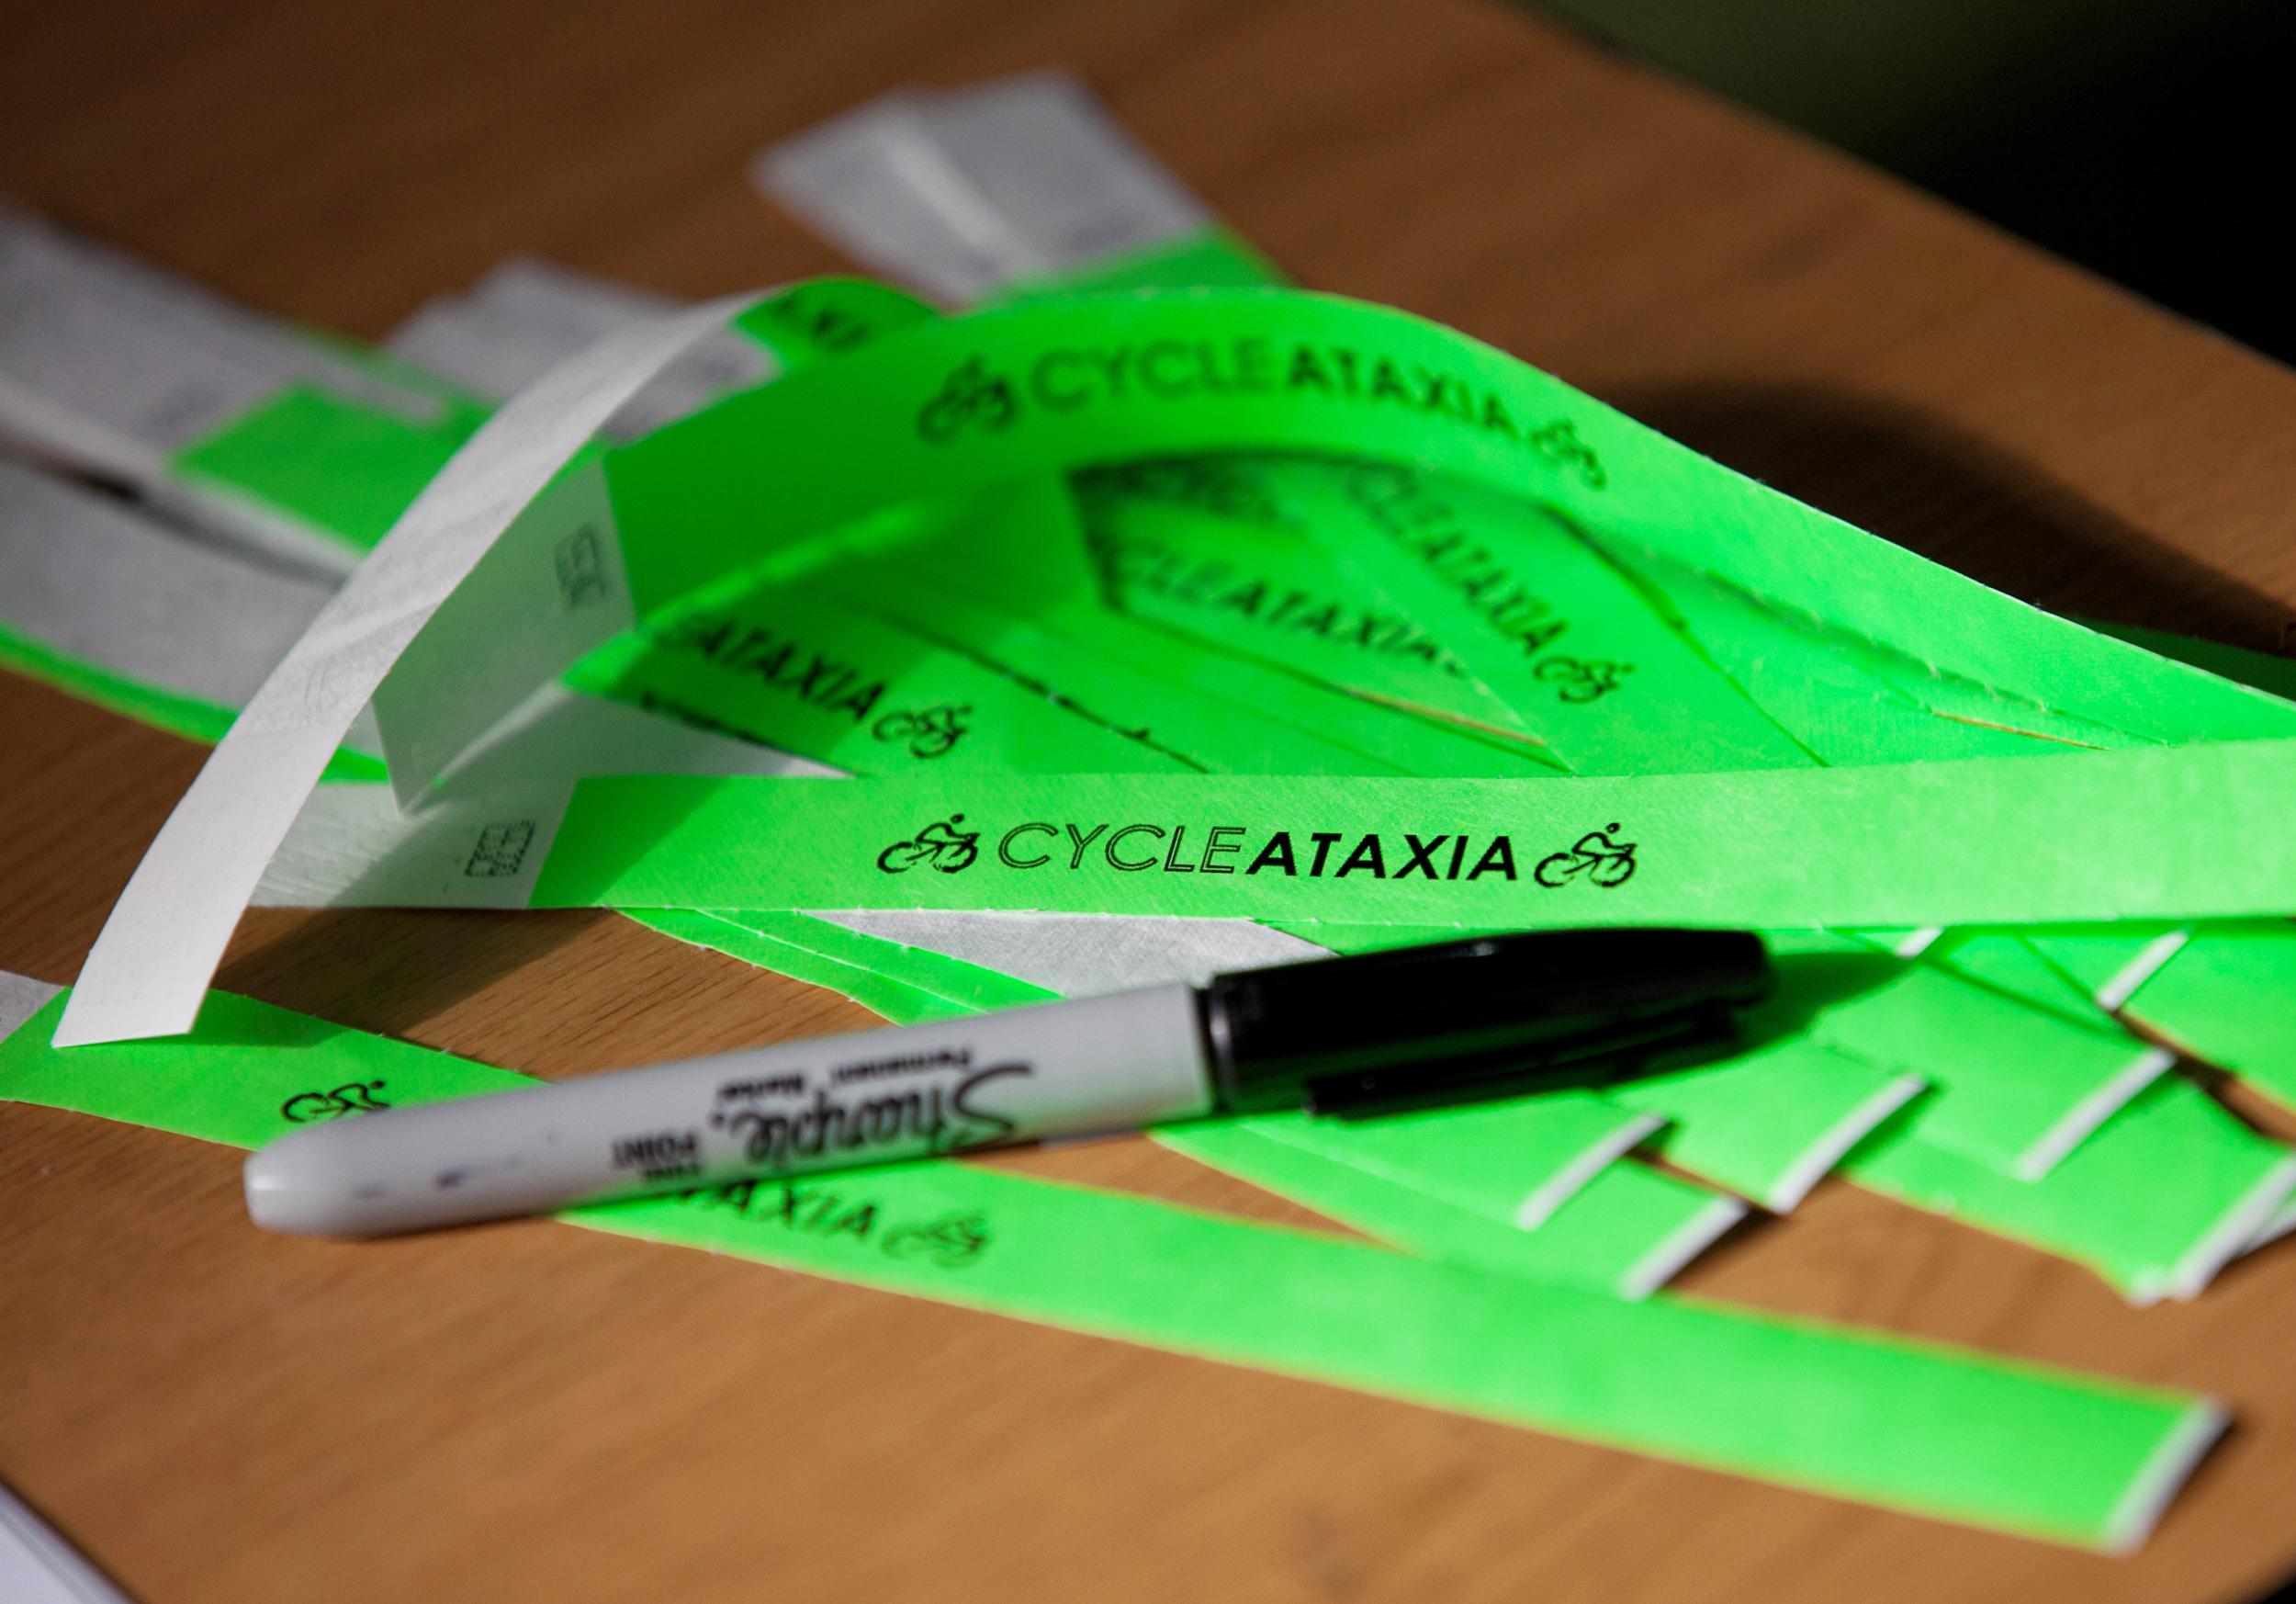 024_Cycle_Ataxia.jpg